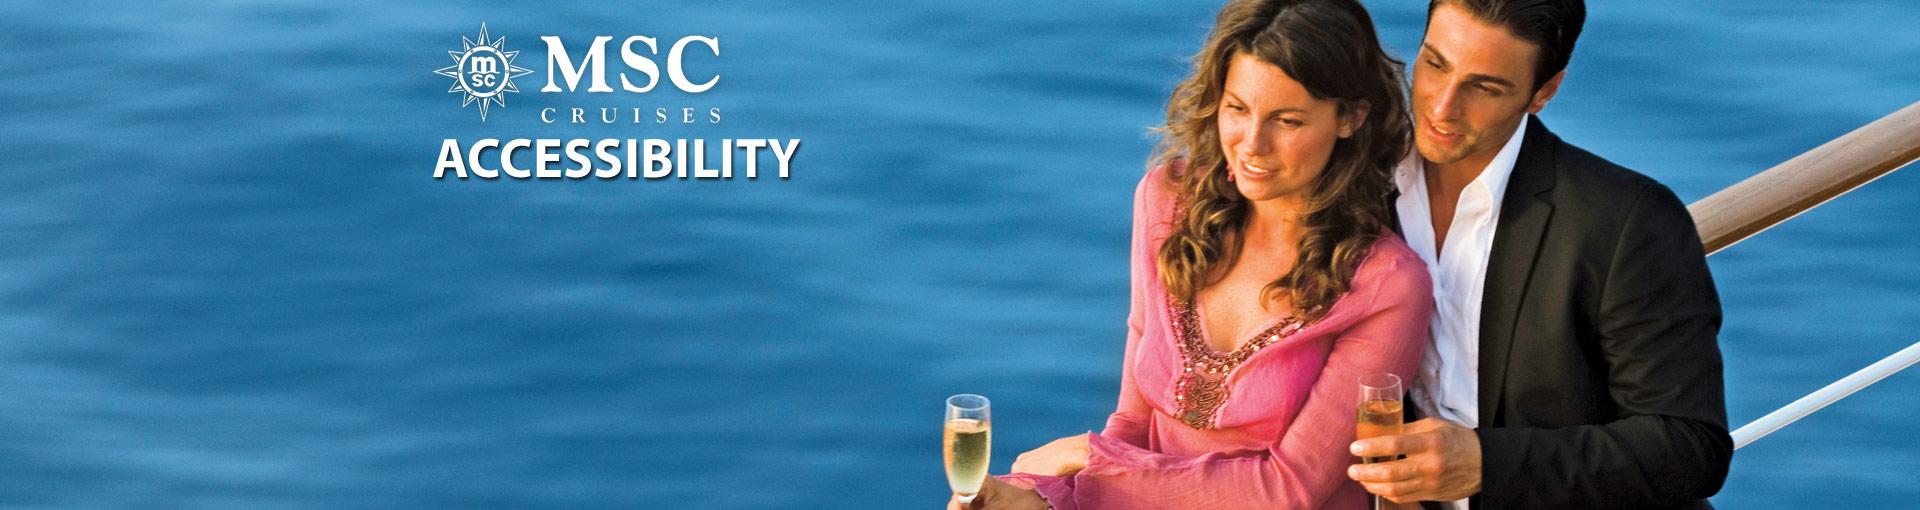 MSC Cruises Accessibility